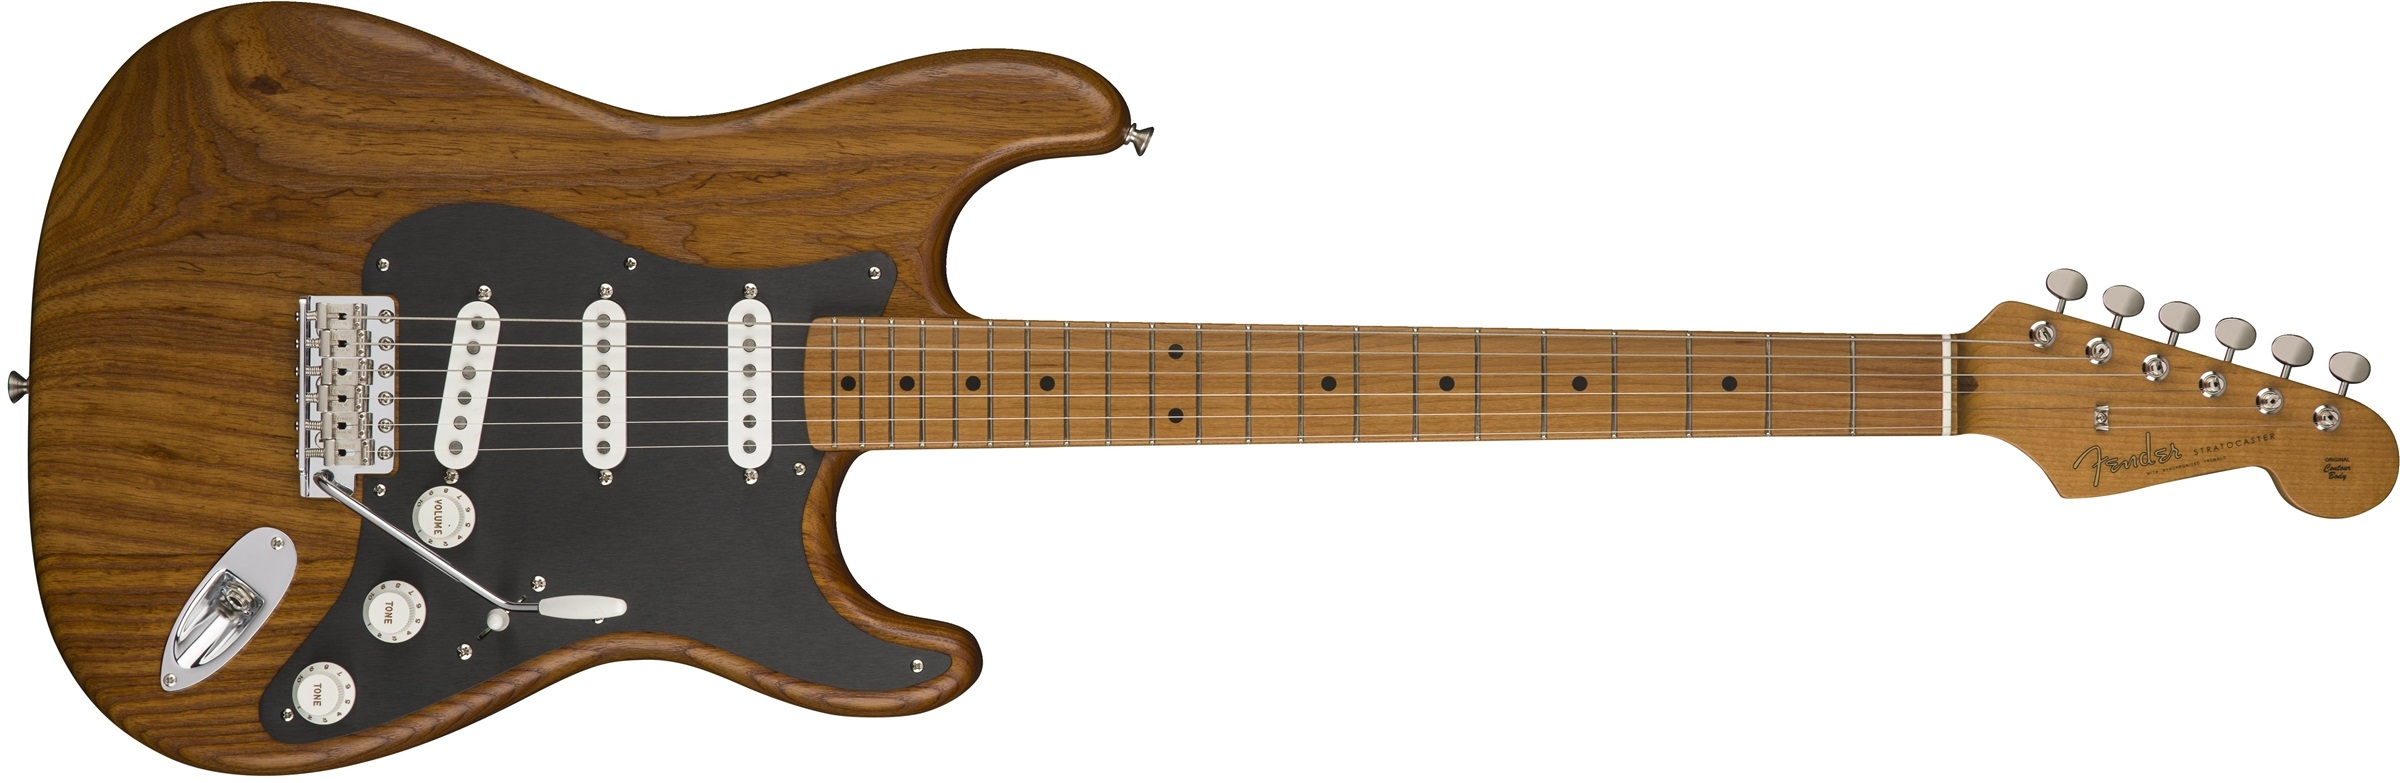 Fender 56 Stratocaster Roasted Ash Ltd